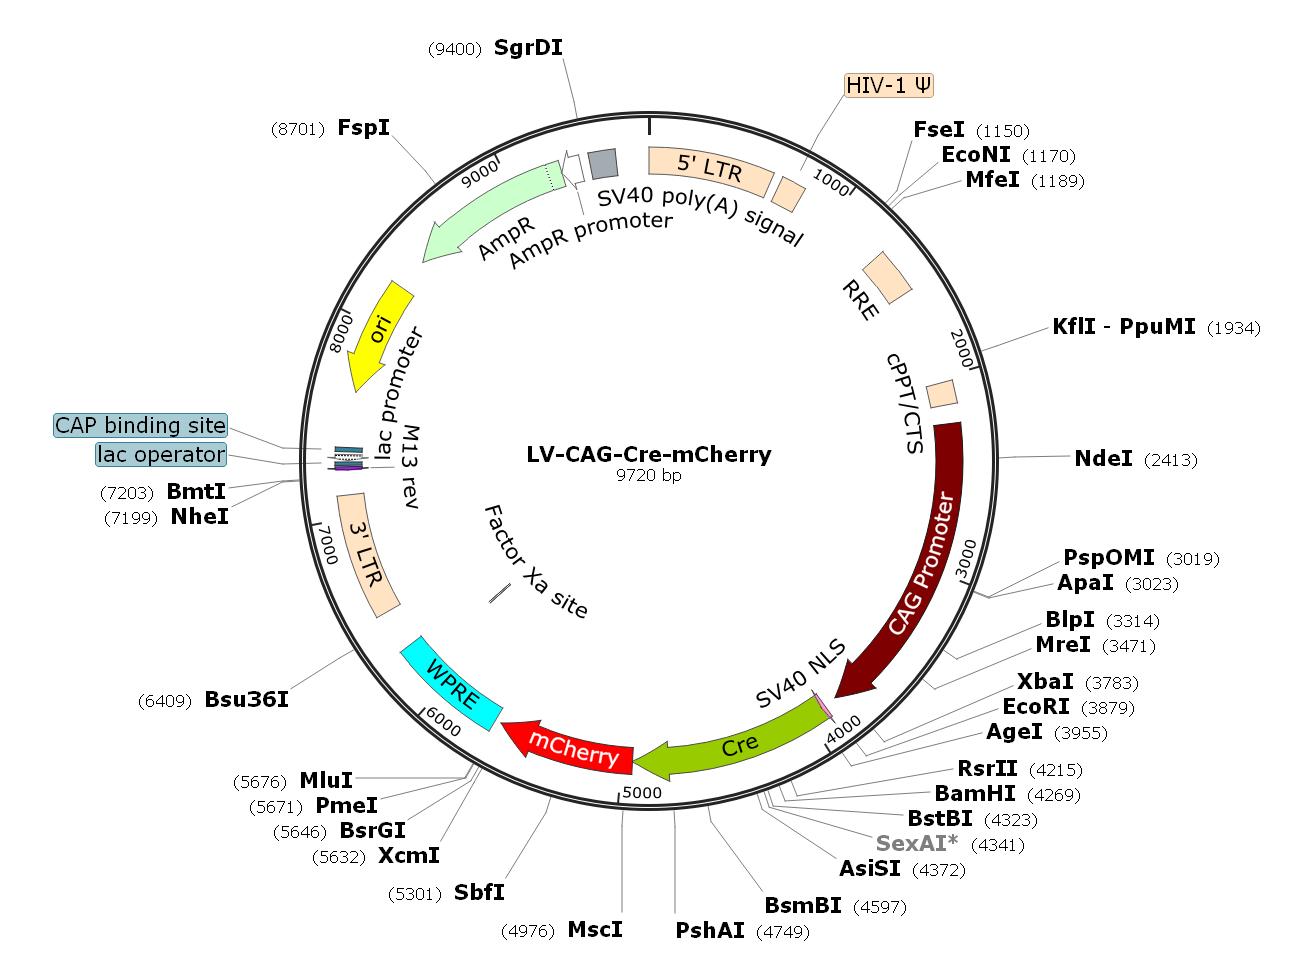 Pre-made recombinant lentivirus; LV-CAG-Cre-mCherry; LV-CBA-Cre-mCherry; CAG-Cre-mCherry Lentivirus; CBA-Cre-mCherry Lentivirus